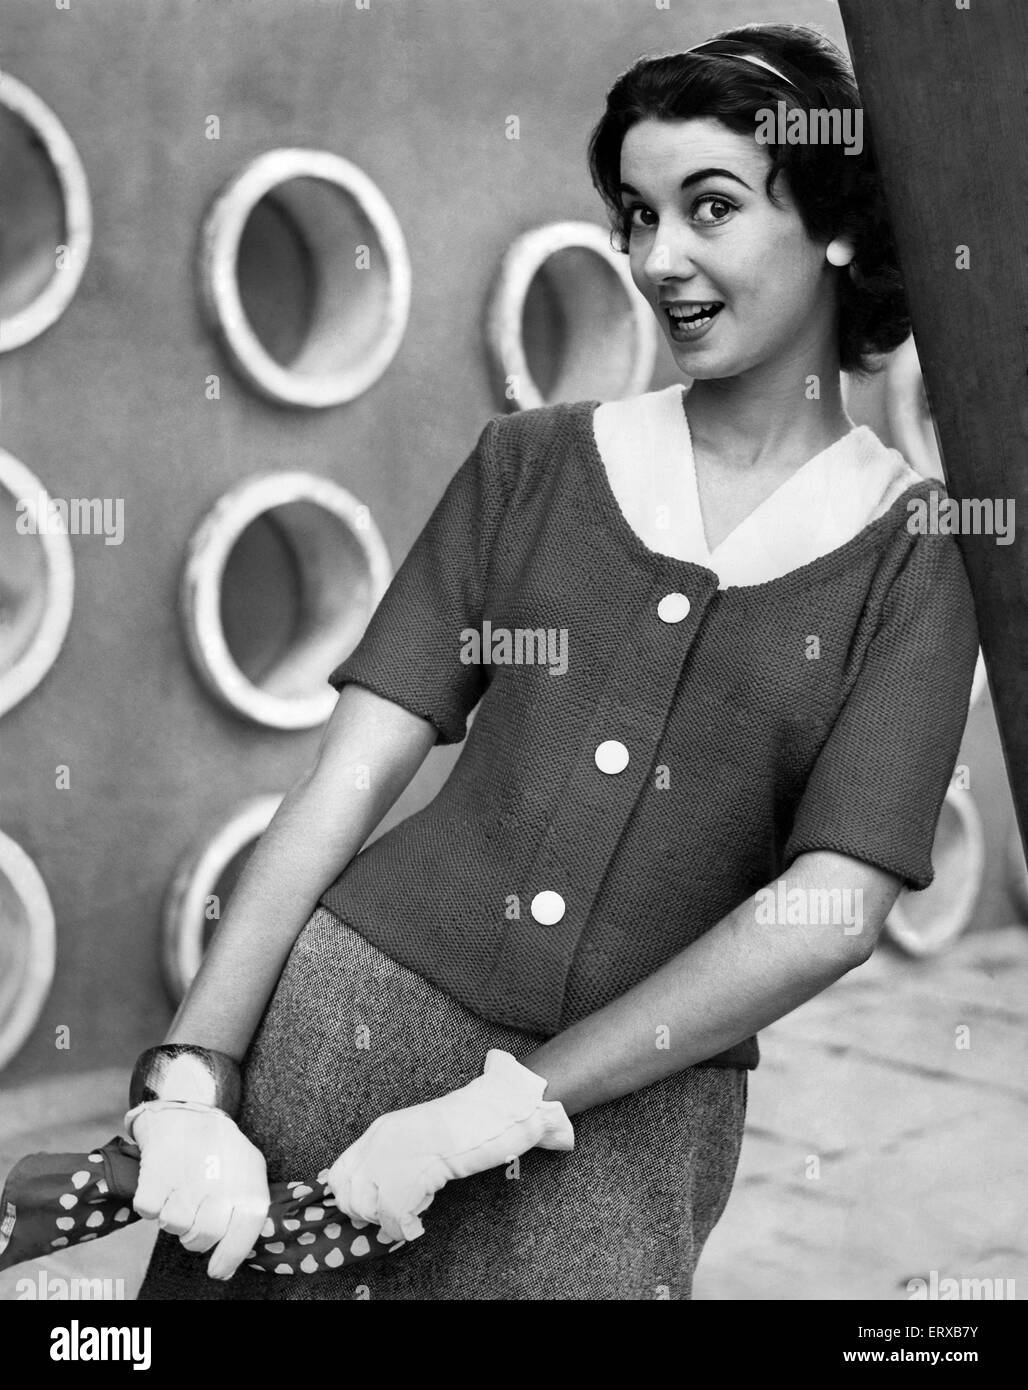 A woman modelling Knitwear. September 1956 Stock Photo